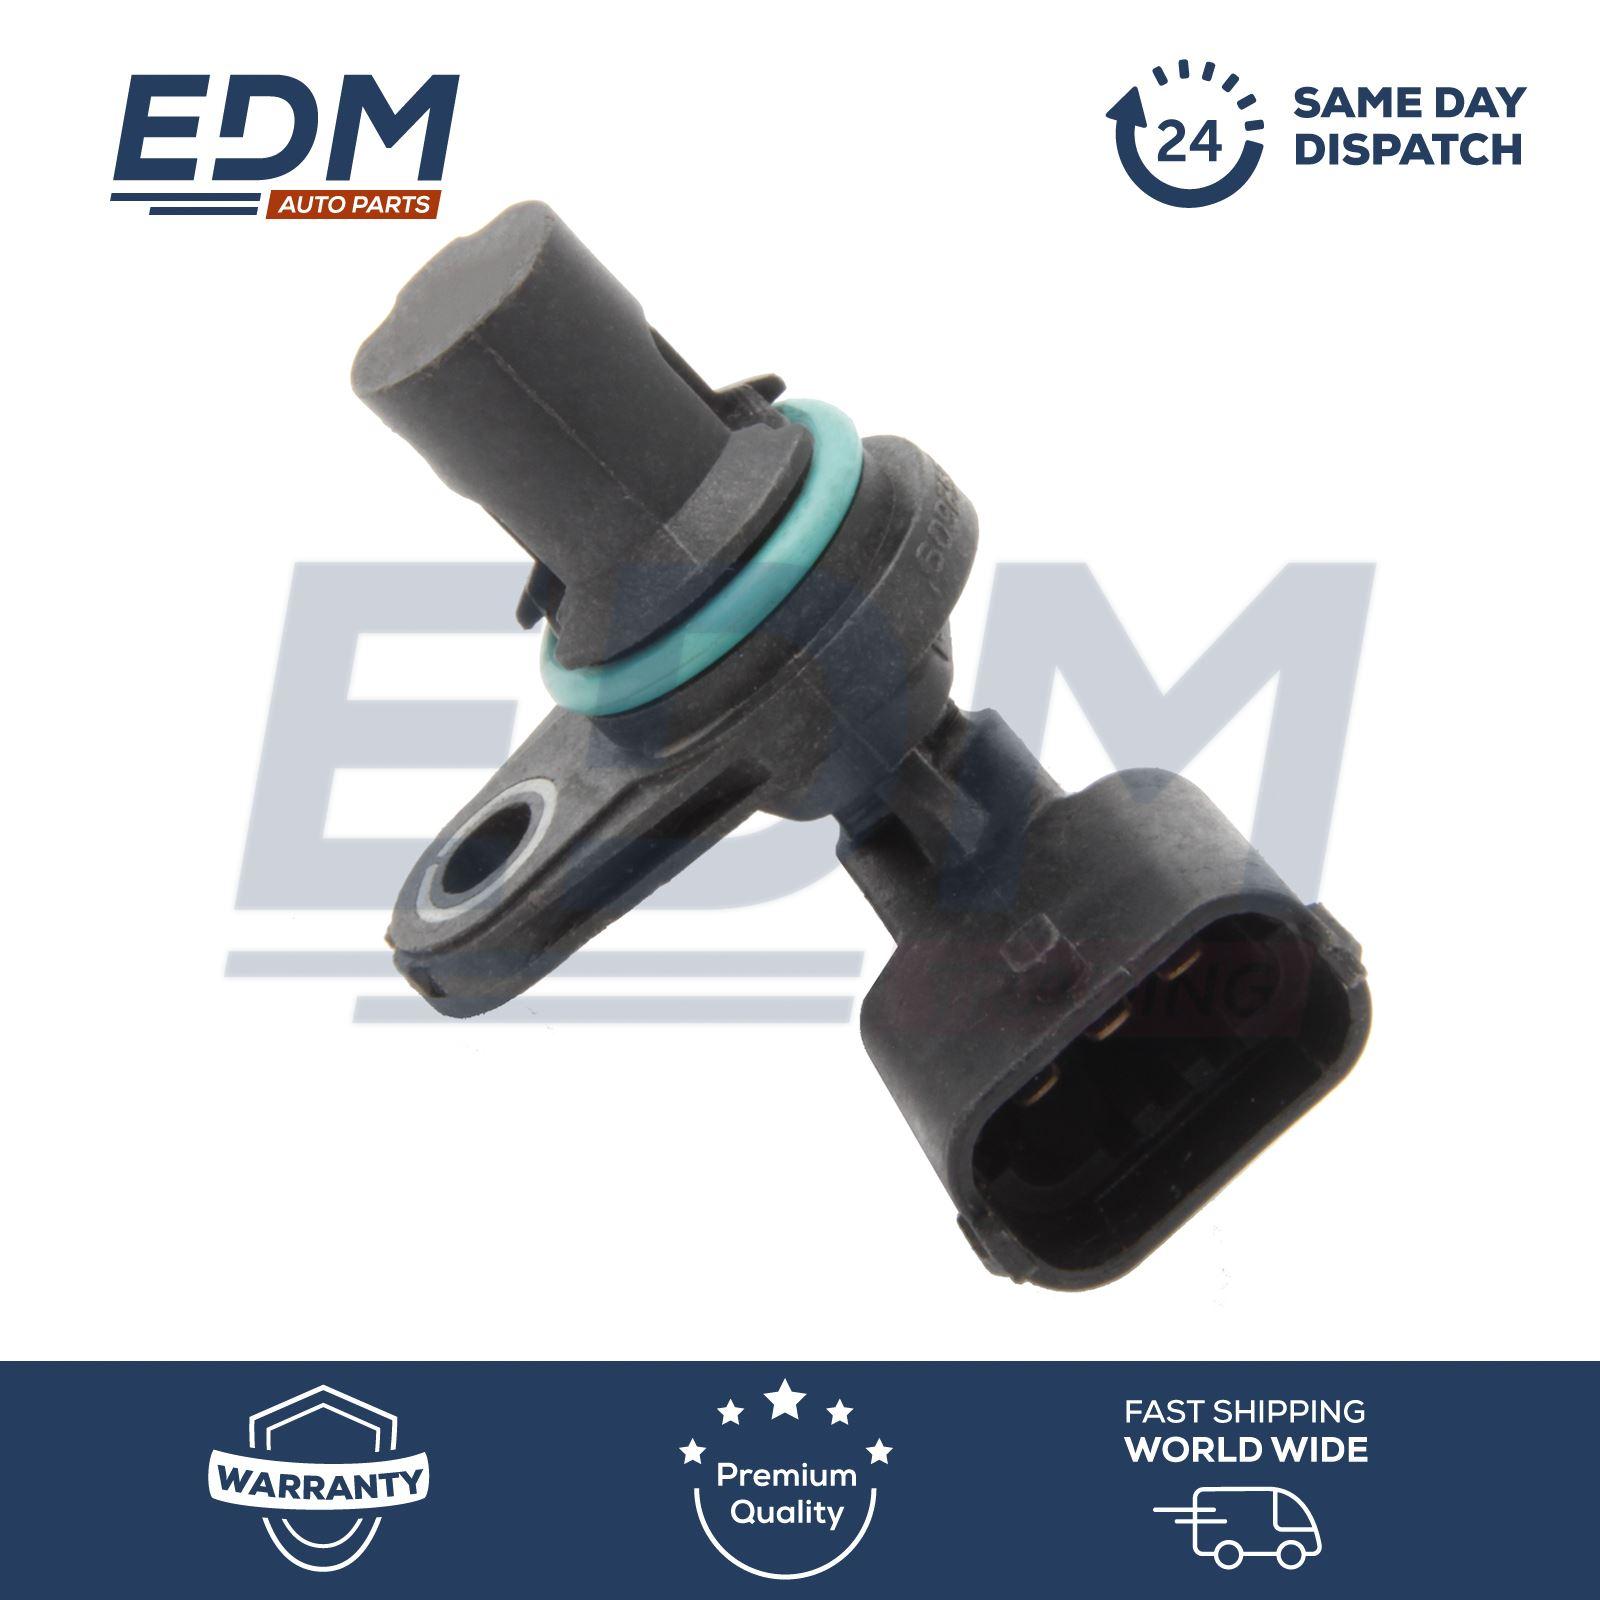 Camshaft Position sensor For ALFA Vauxhall Fiat 1.6 1.8 2.2 55352609  6235697 UK